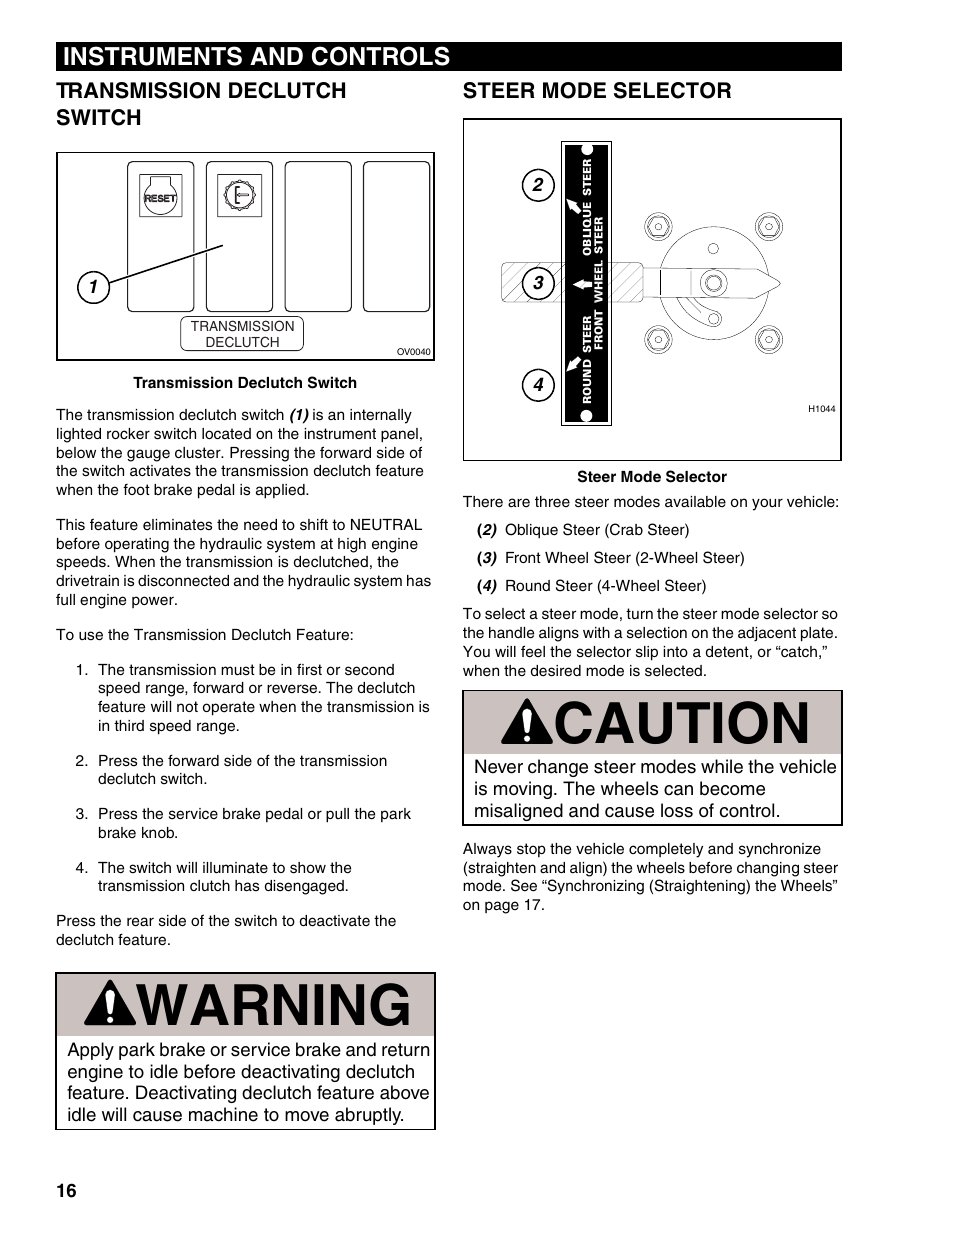 Transmission Declutch Switch  Steer Mode Selector  Warning